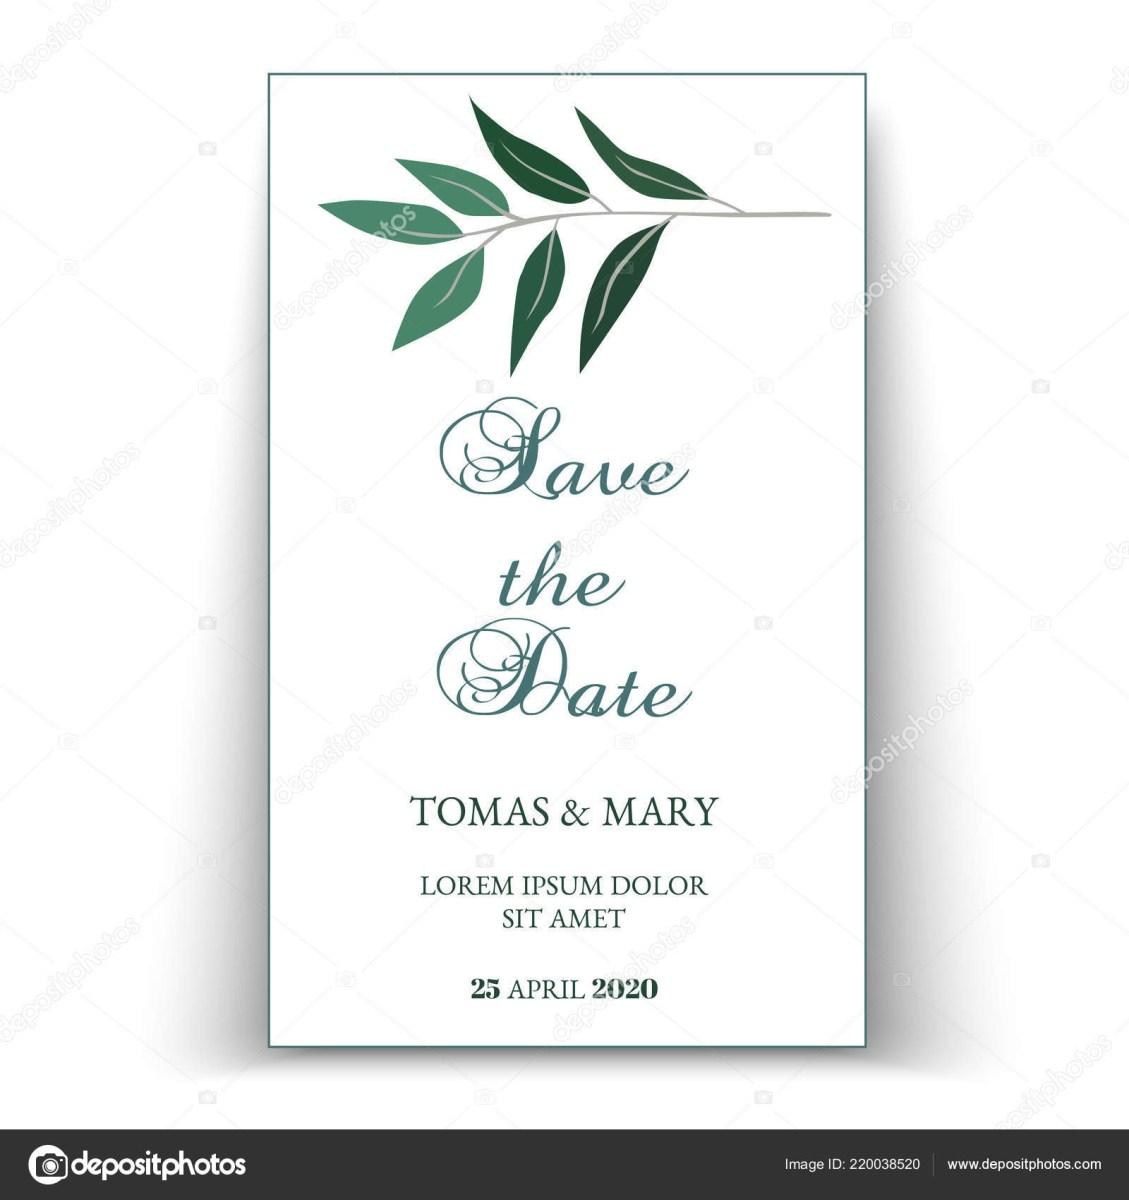 Printable Wedding Invitations Templates Greenery Wedding Invitation Template Printable Wedding Invites